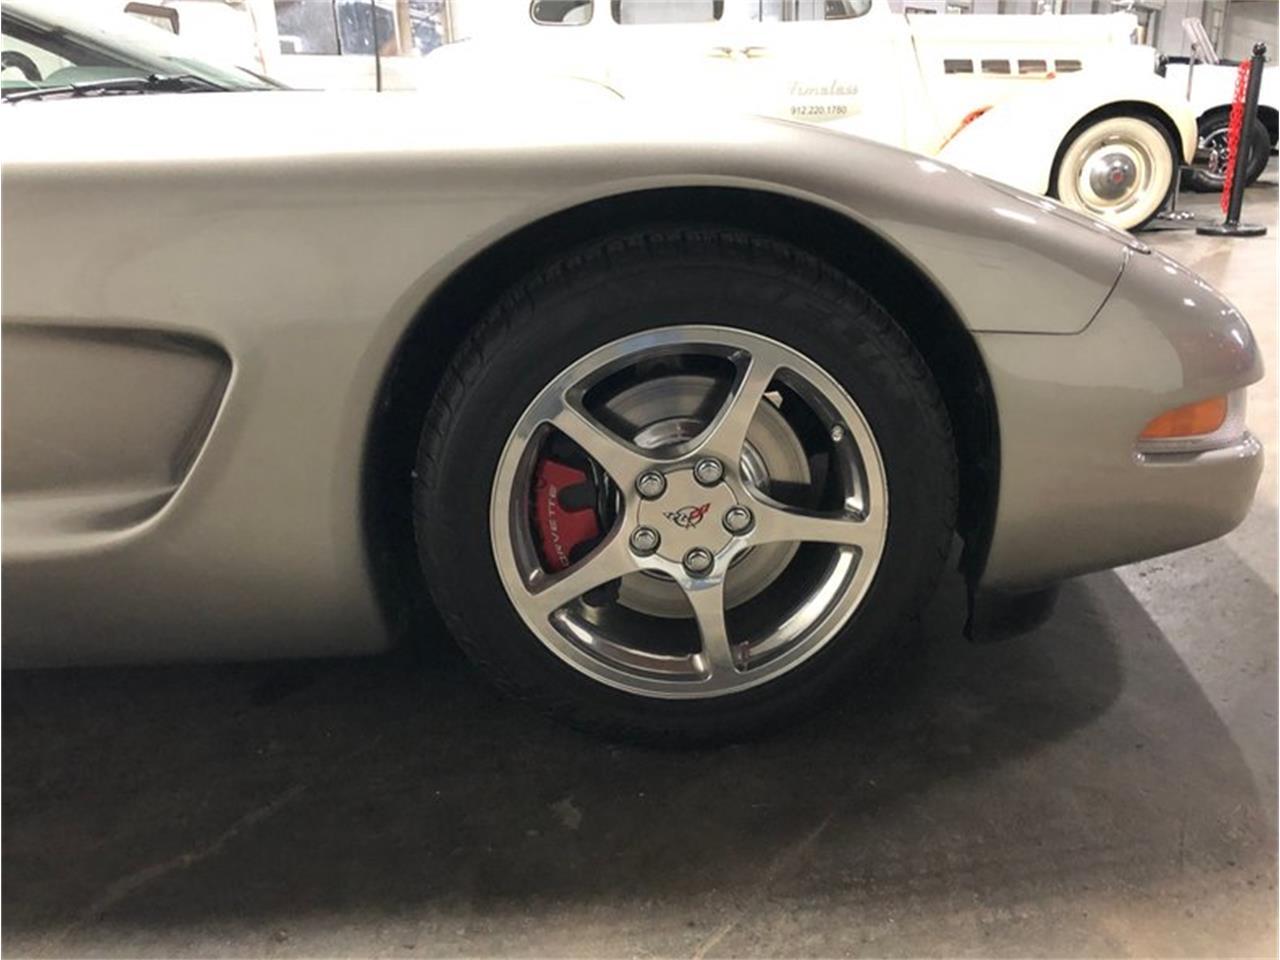 2001 Chevrolet Corvette (CC-1319303) for sale in Savannah, Georgia